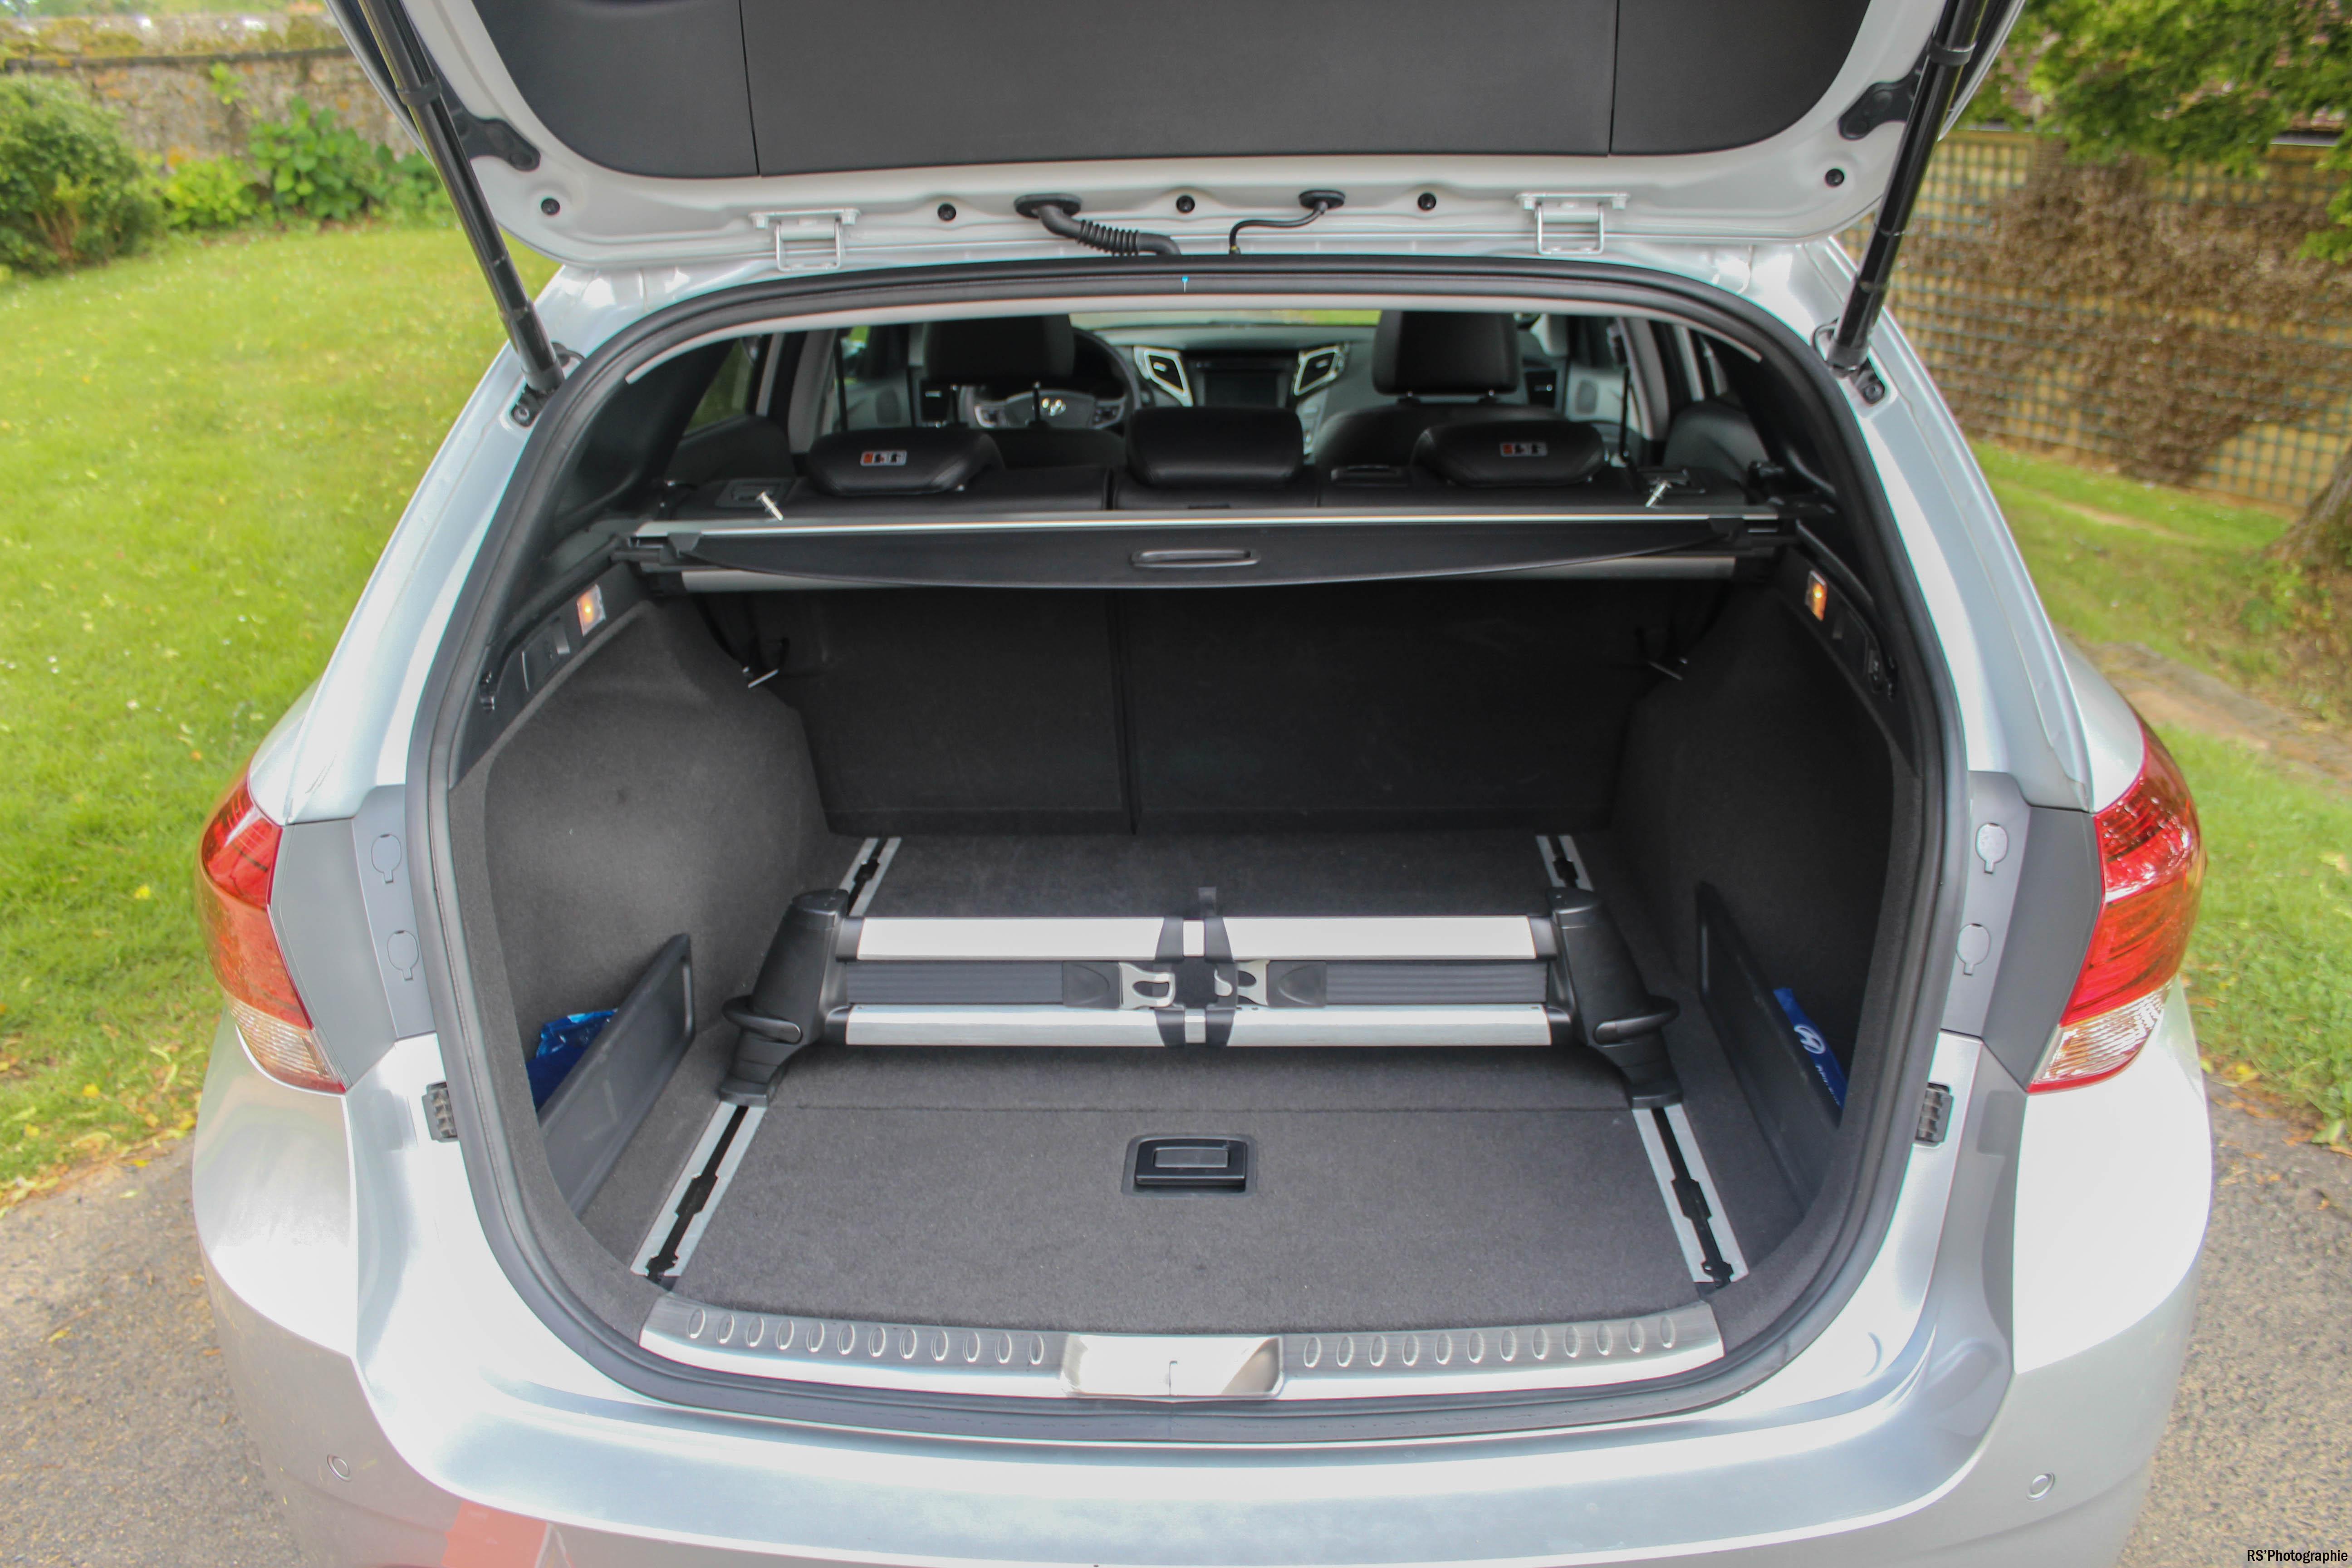 Hyundaii40SW15-hyundai-i40-sw-arriere-rear-Arnaud Demasier-RSPhotographie